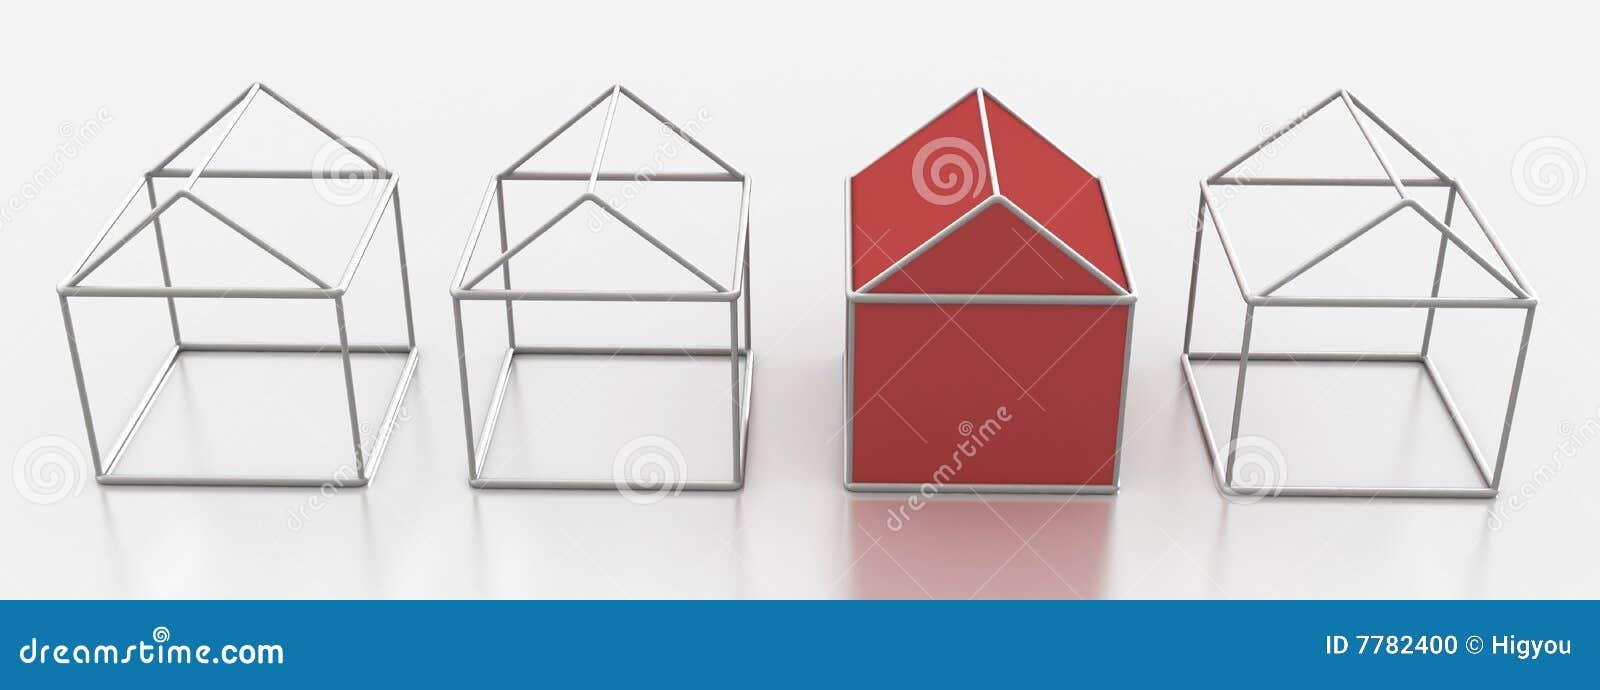 Metal Wire Houses stock illustration. Illustration of fake - 7782400